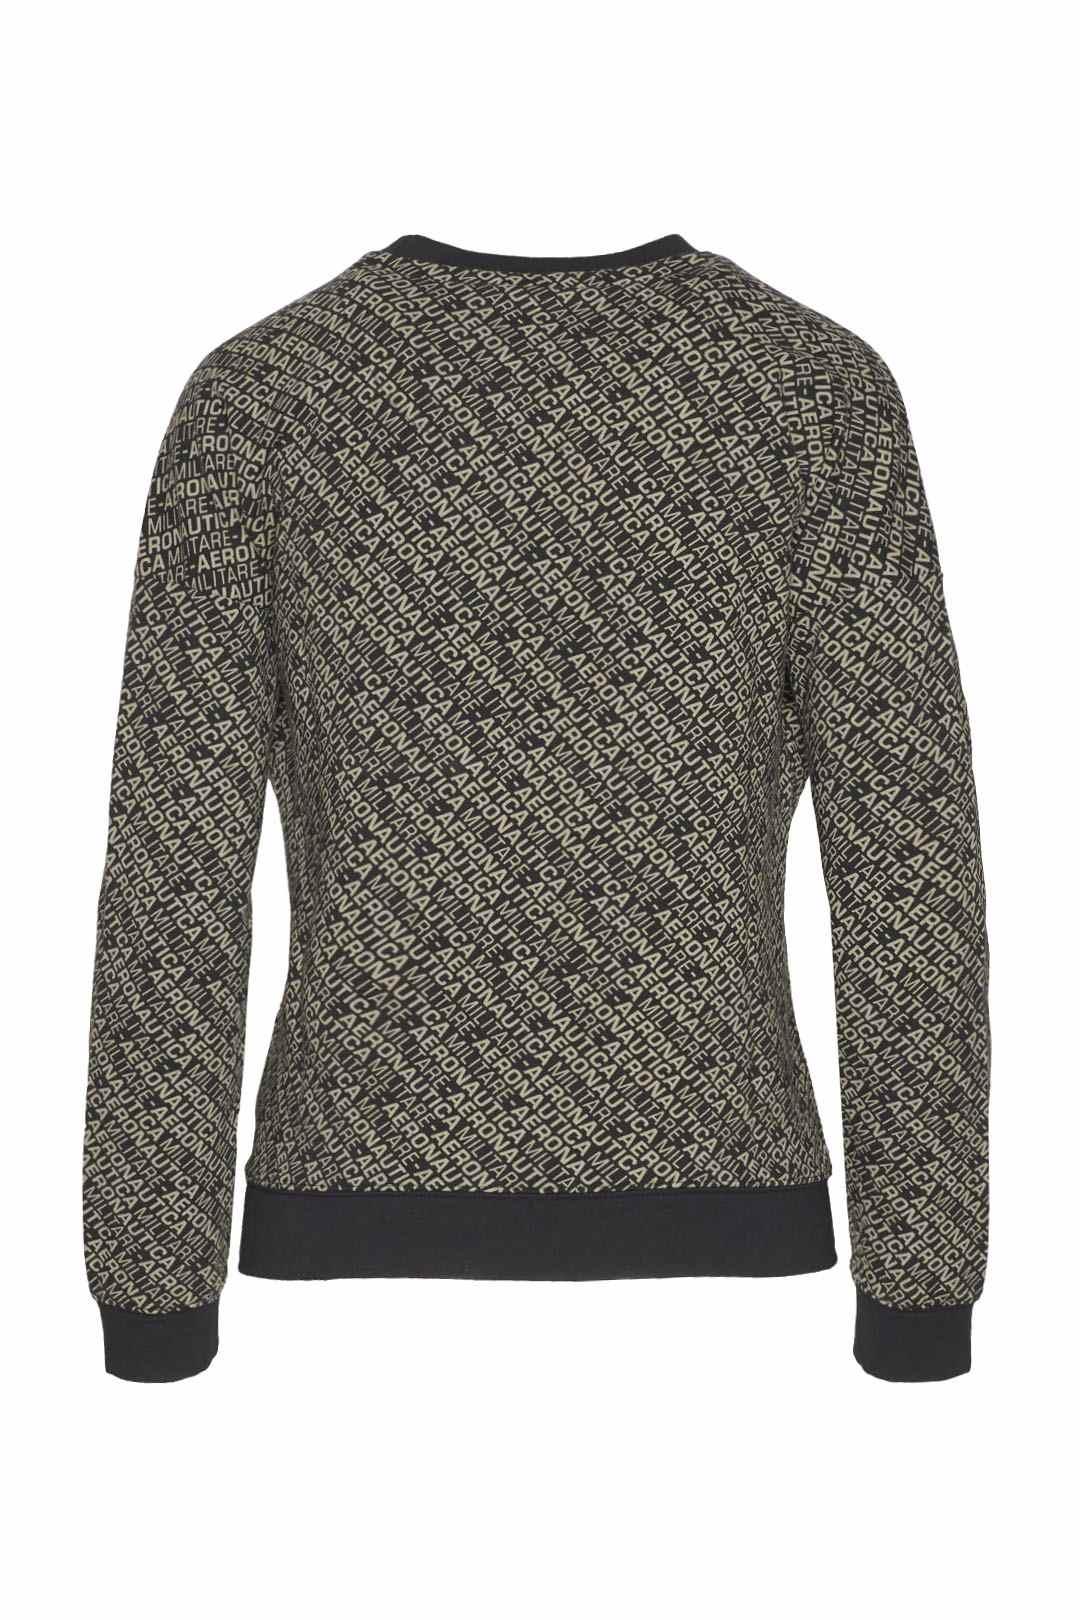 Crew neck sweatshirt with all-over print 2